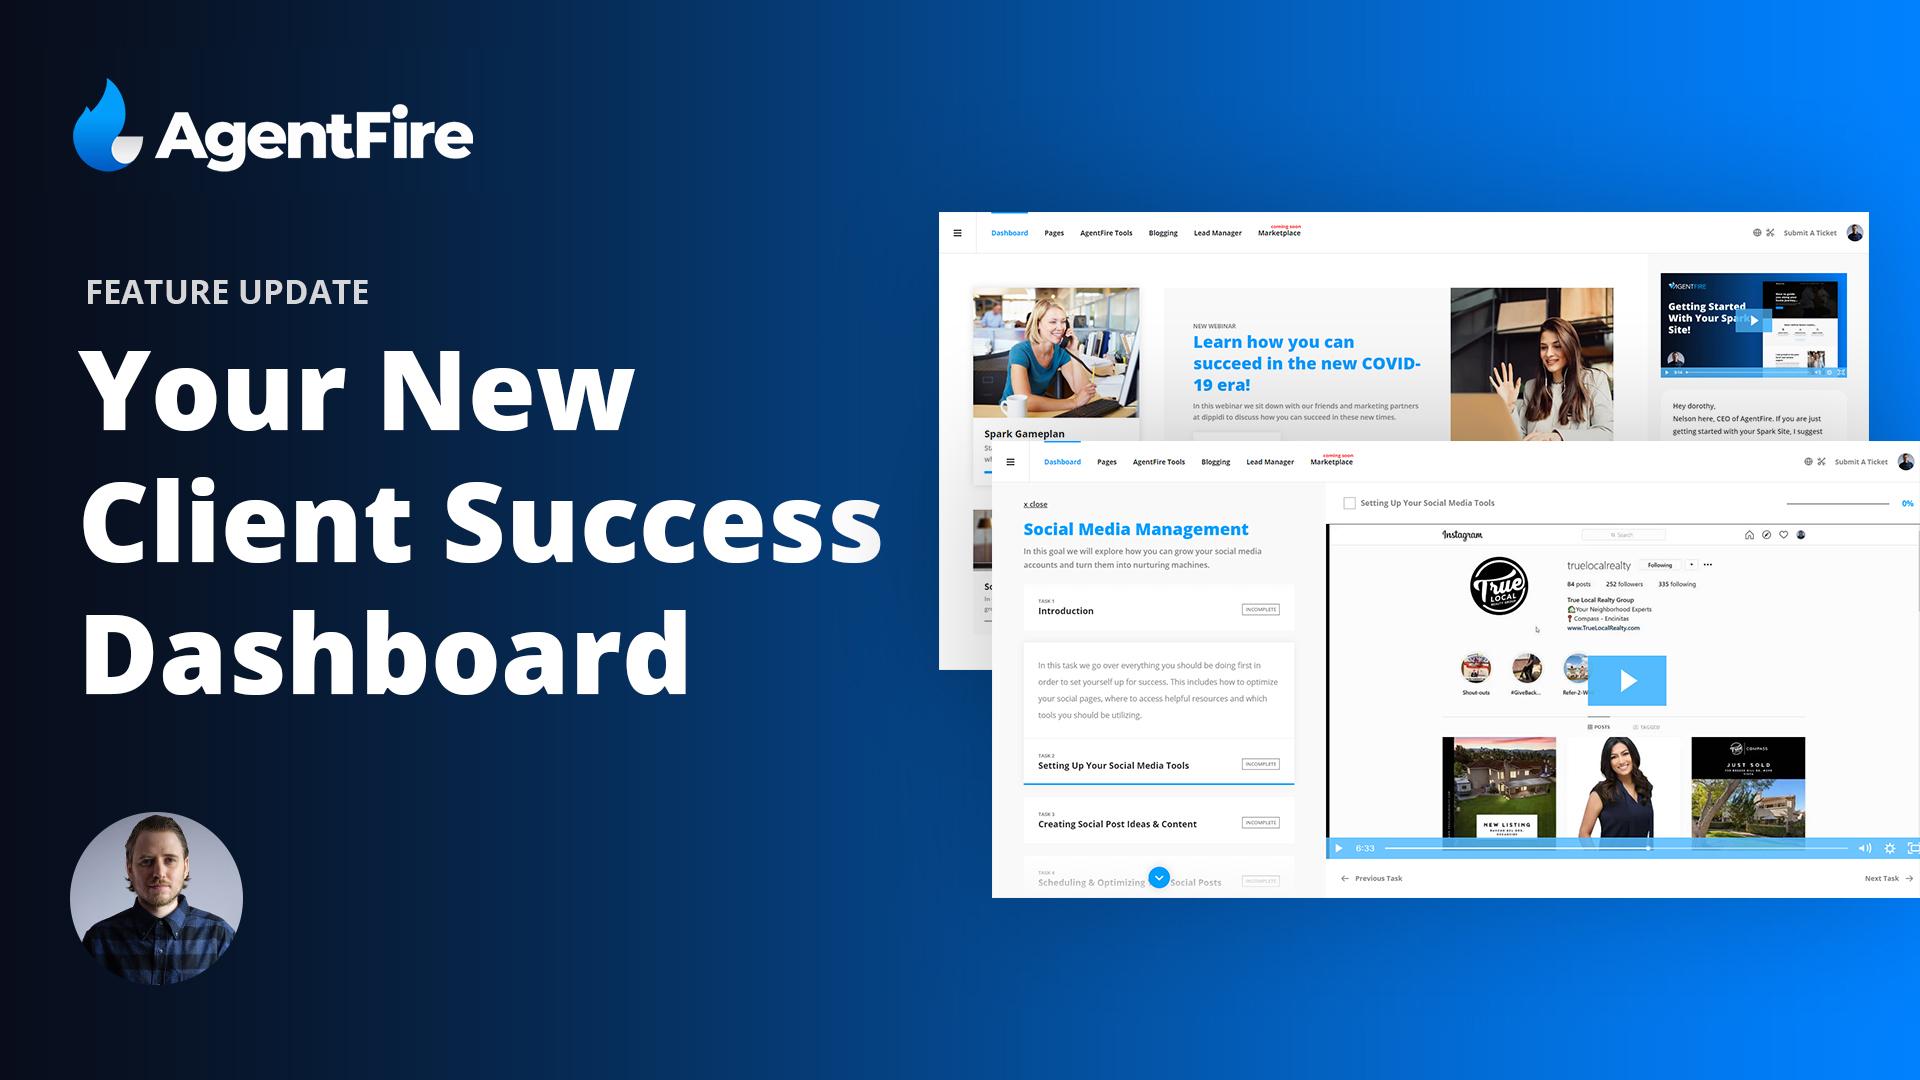 AgentFire Success Dashboard